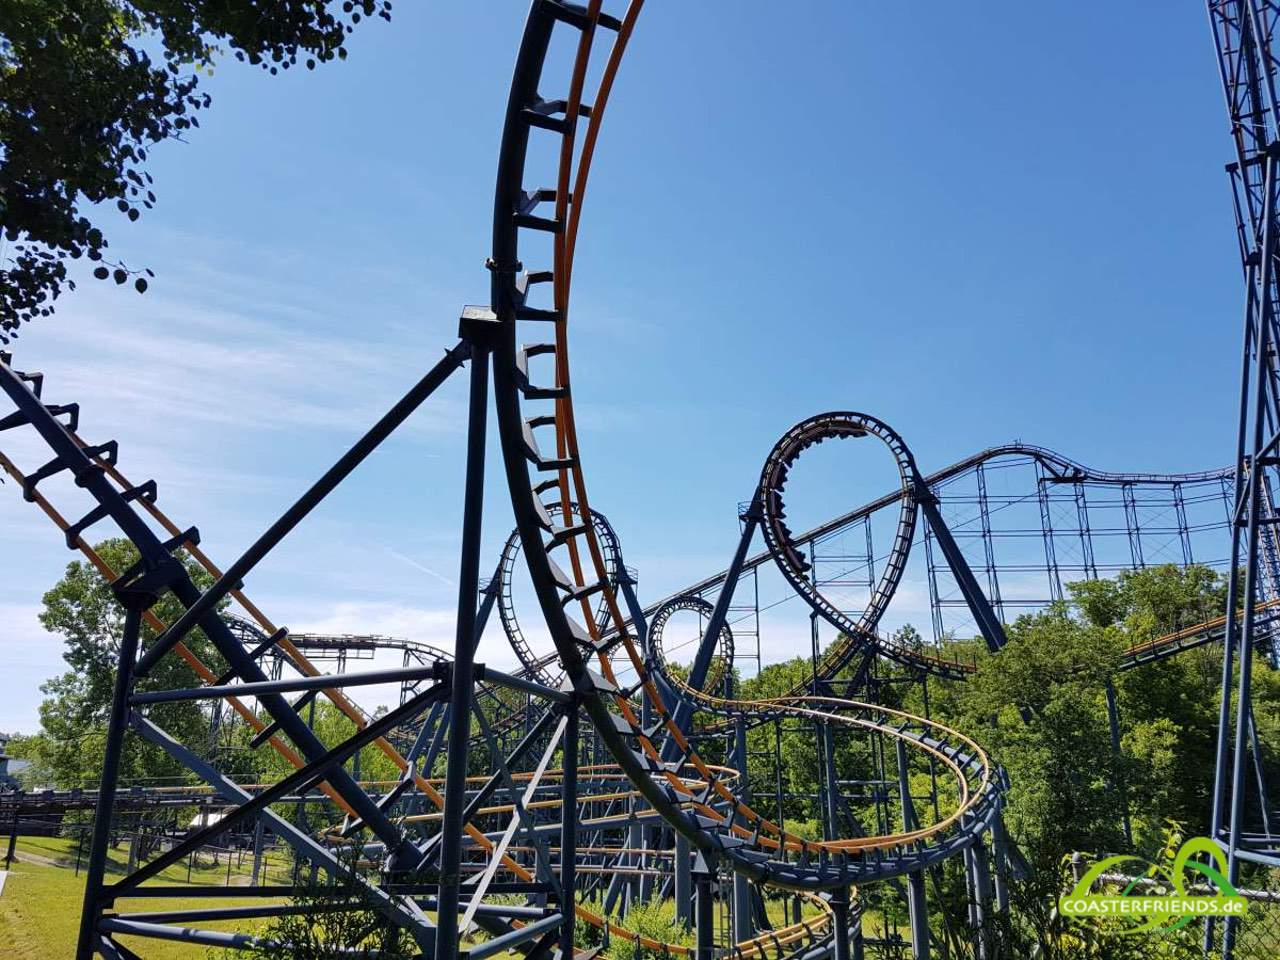 Nordamerika - https://coasterfriends.de/joomla//images/pcp_parkdetails/nordamerika/o1484_kings_island/content2.jpg